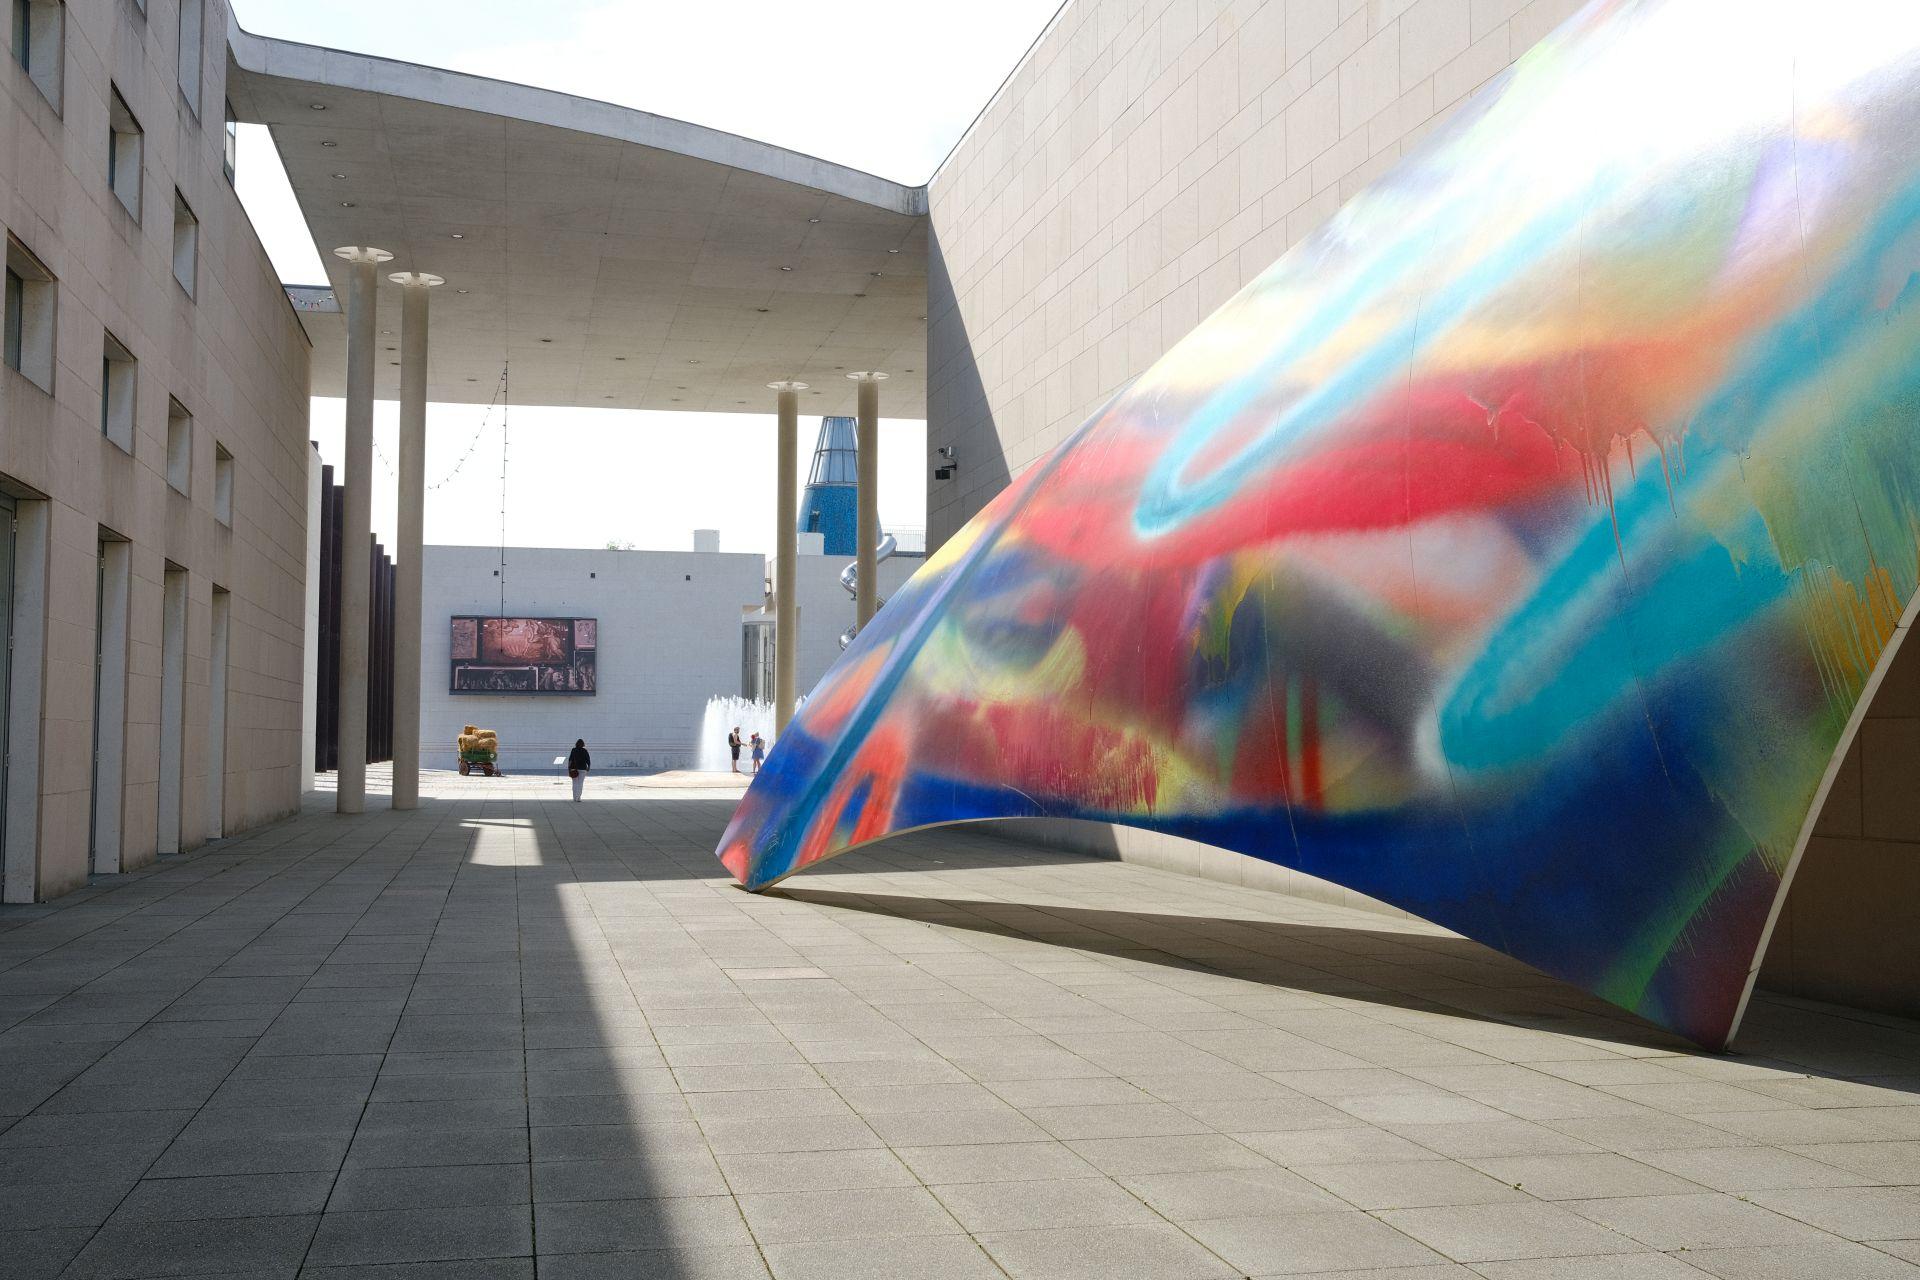 Bundeskunsthalle f/8 1/160sec ISO-160 23mm